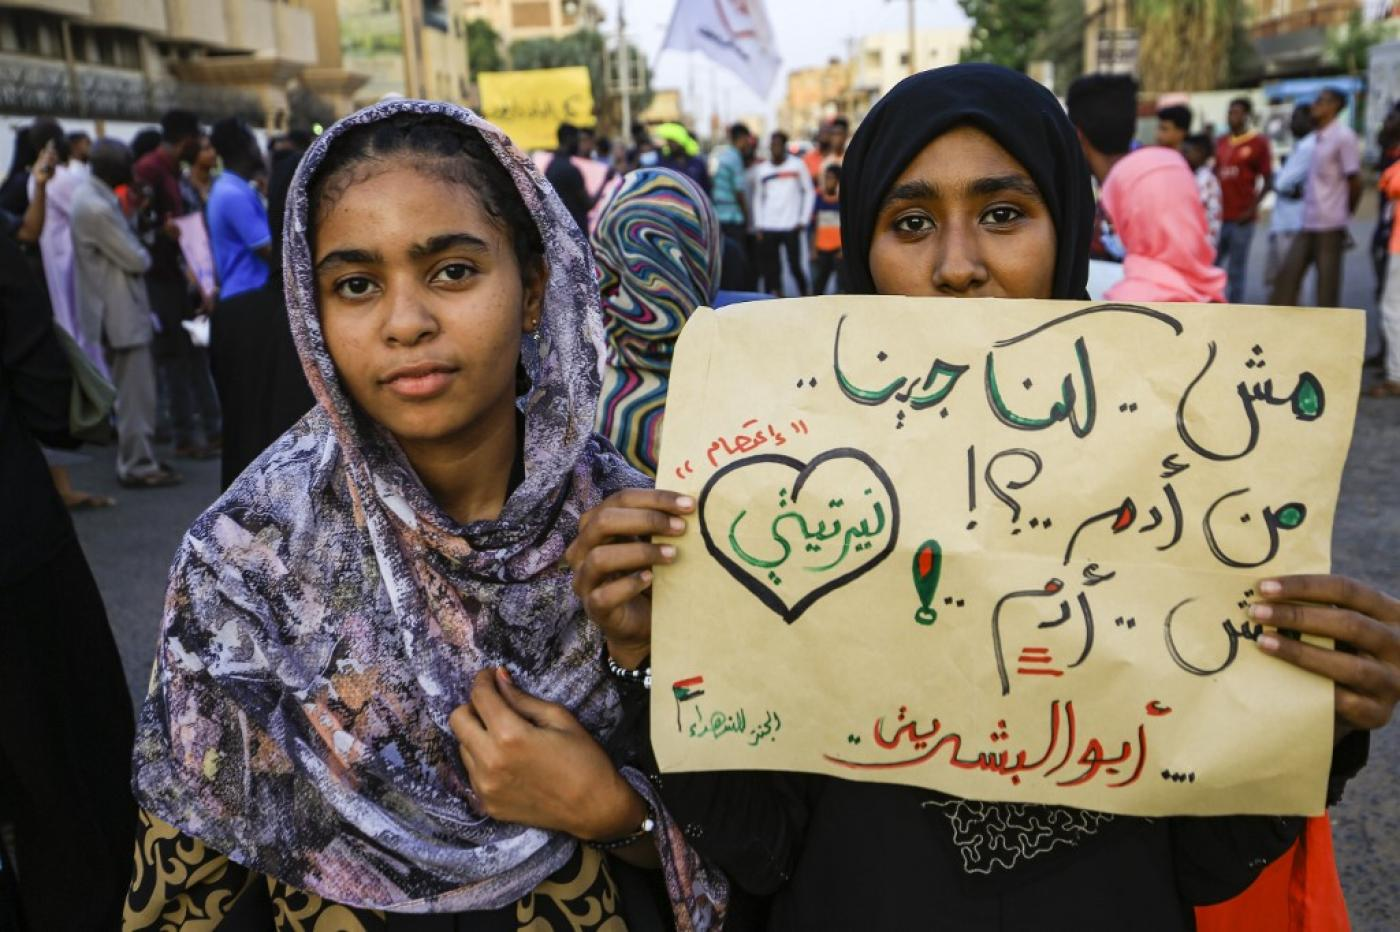 Sudan to deploy troops to Darfur after killings